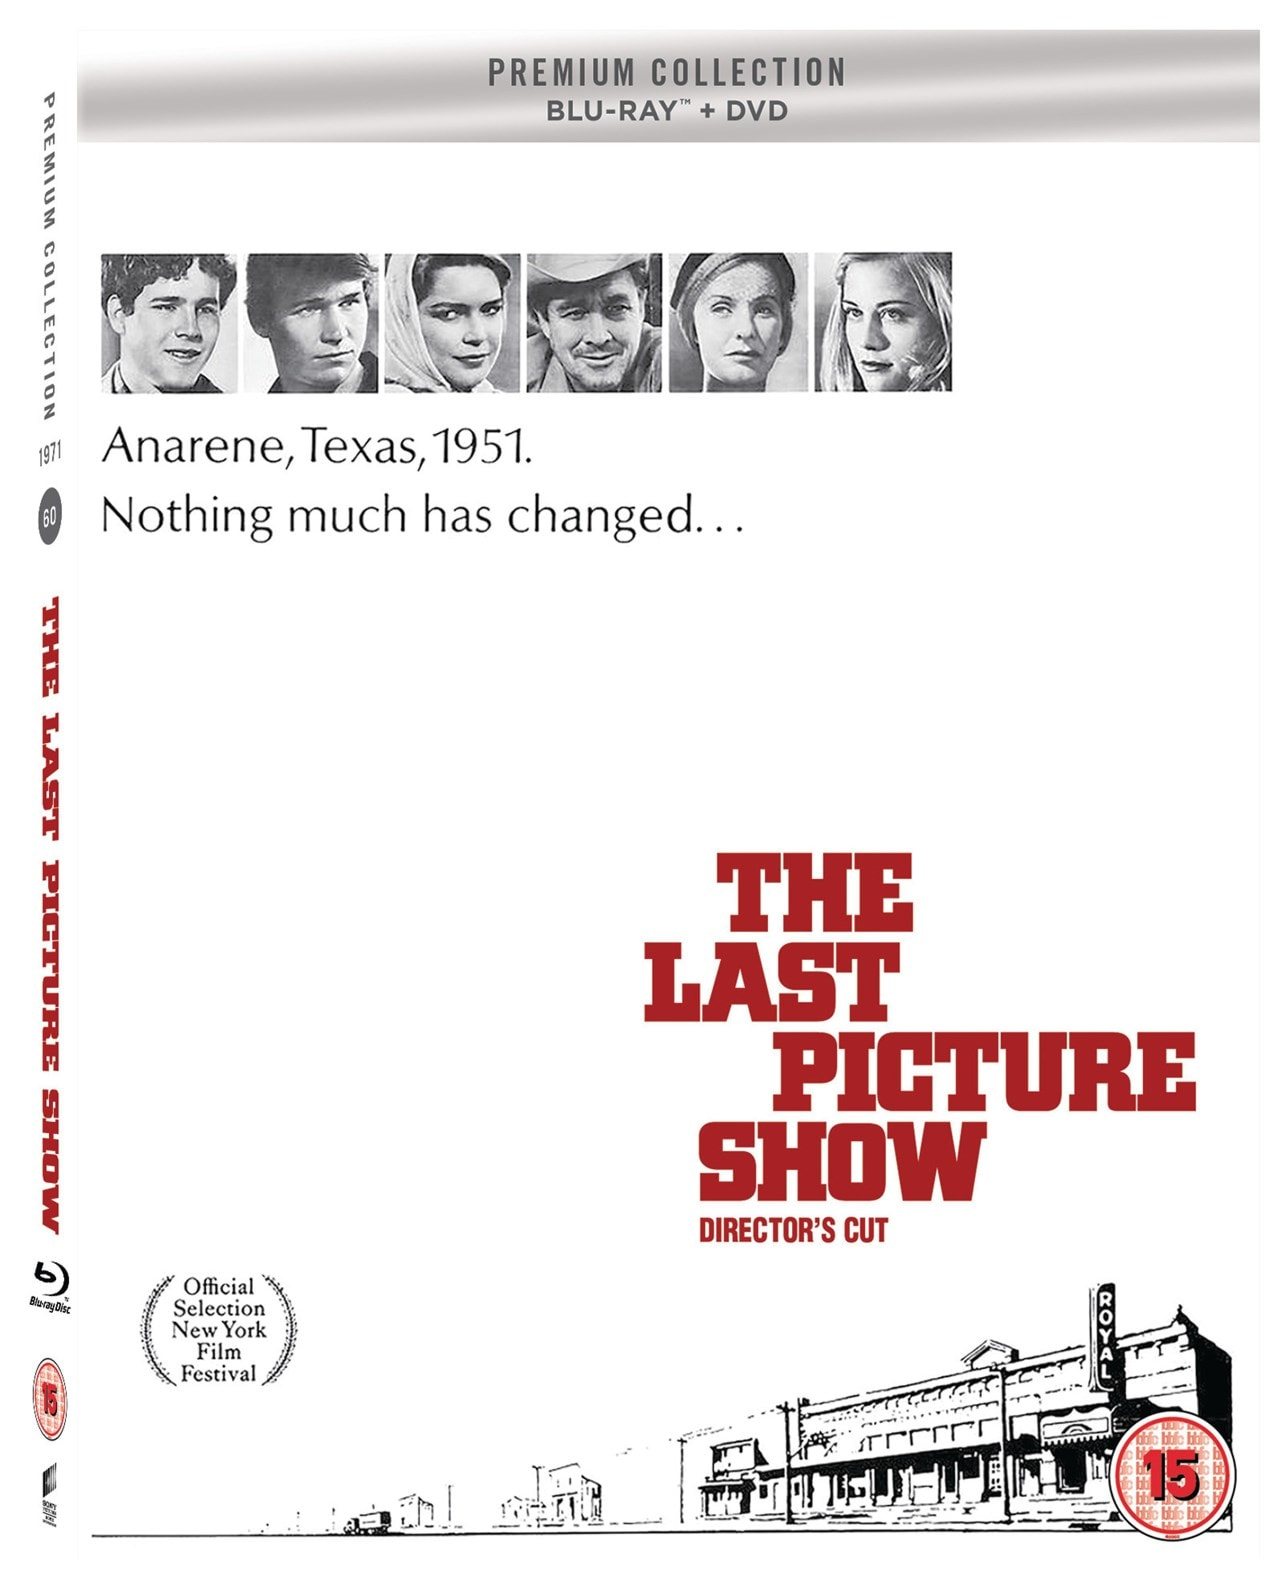 The Last Picture Show (hmv Exclusive) - The Premium Collection - 3